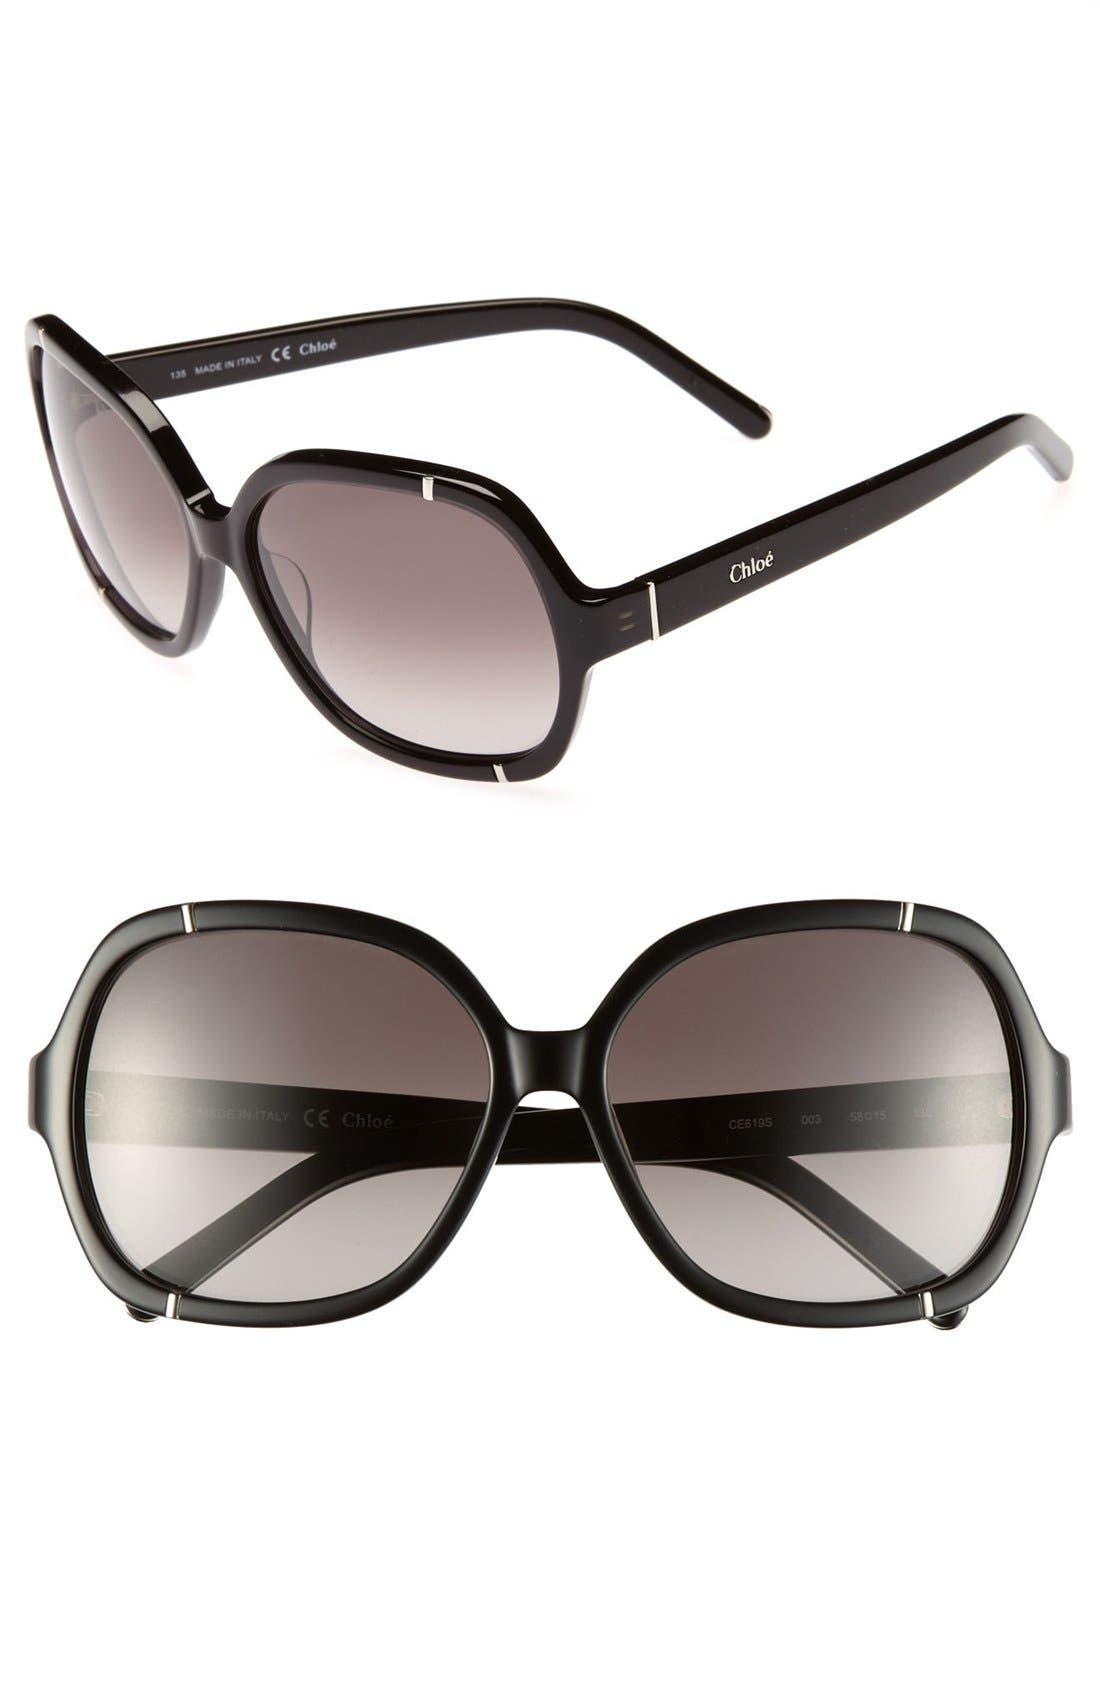 Main Image - Chloé 'Caspia' 58mm Sunglasses